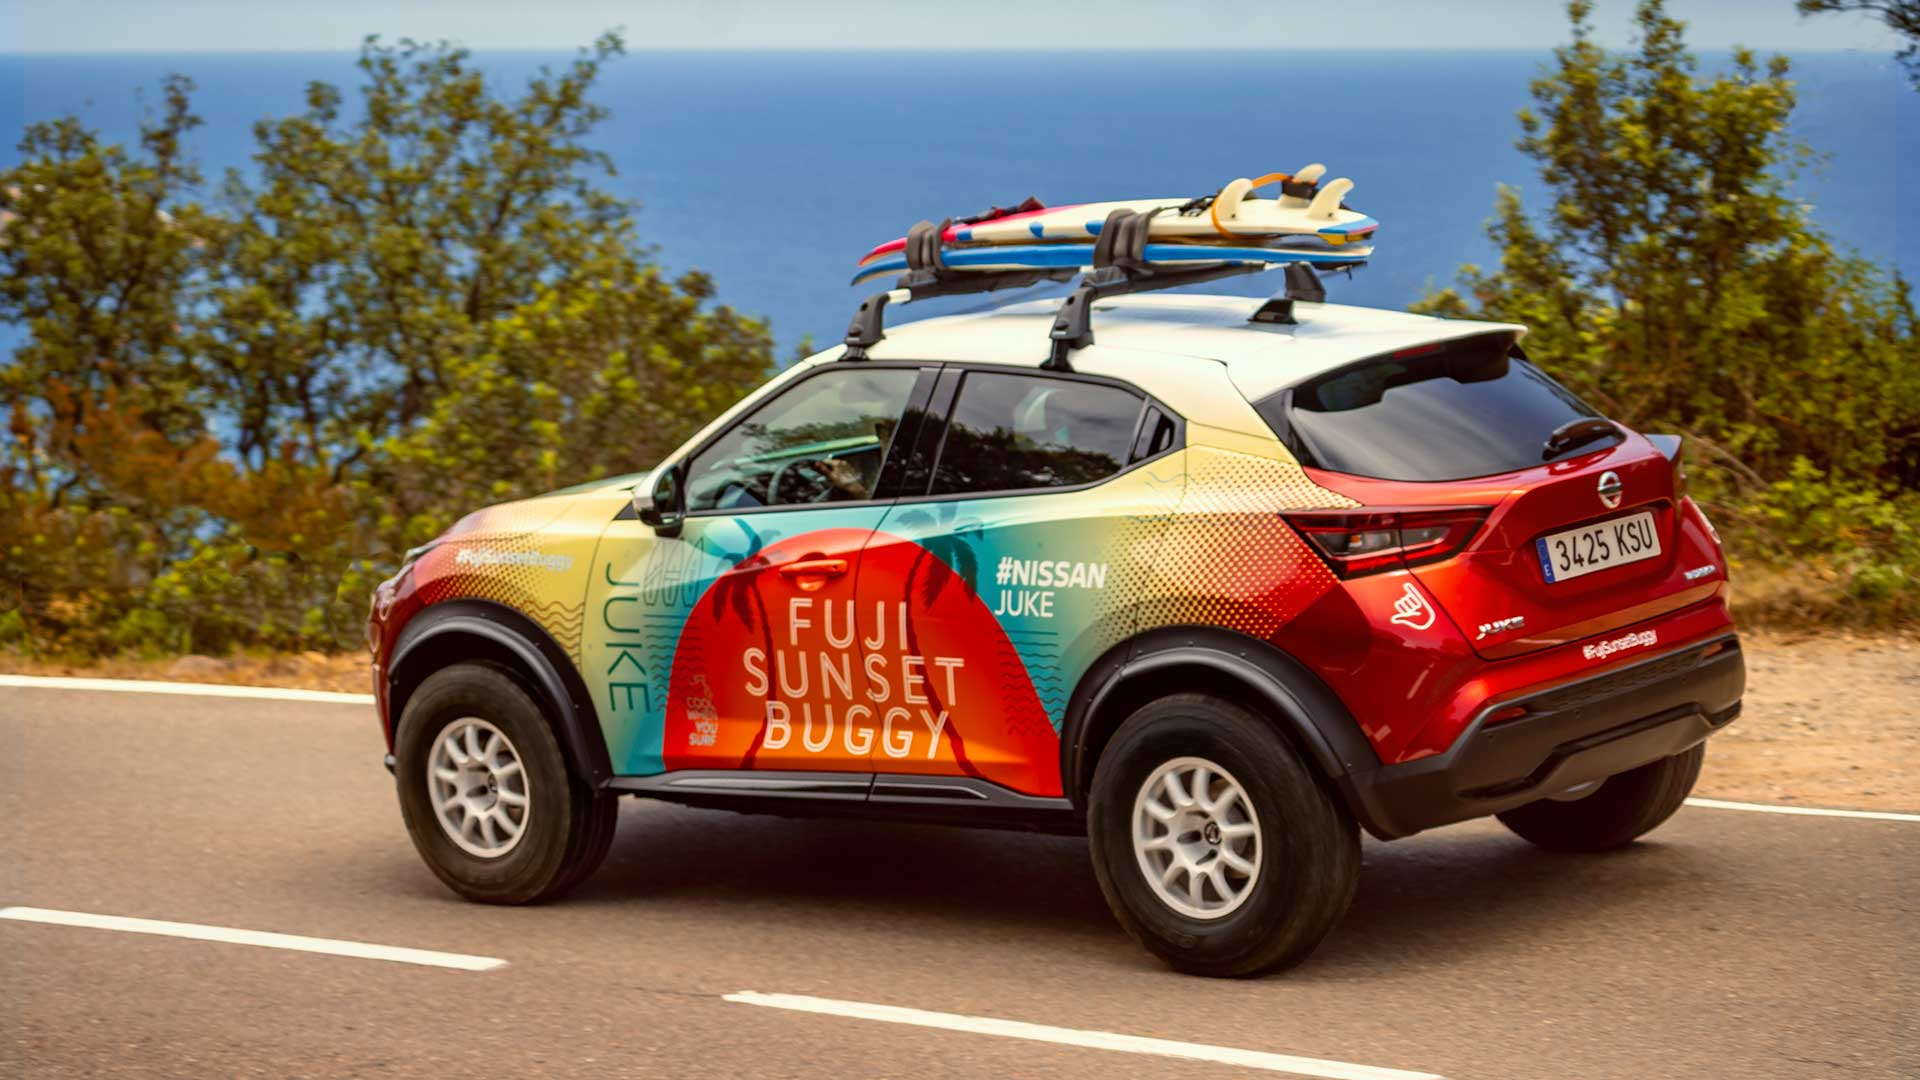 Nissan Juke Fuji Sunset Buggy: un prototipo para disfrutar en la playa